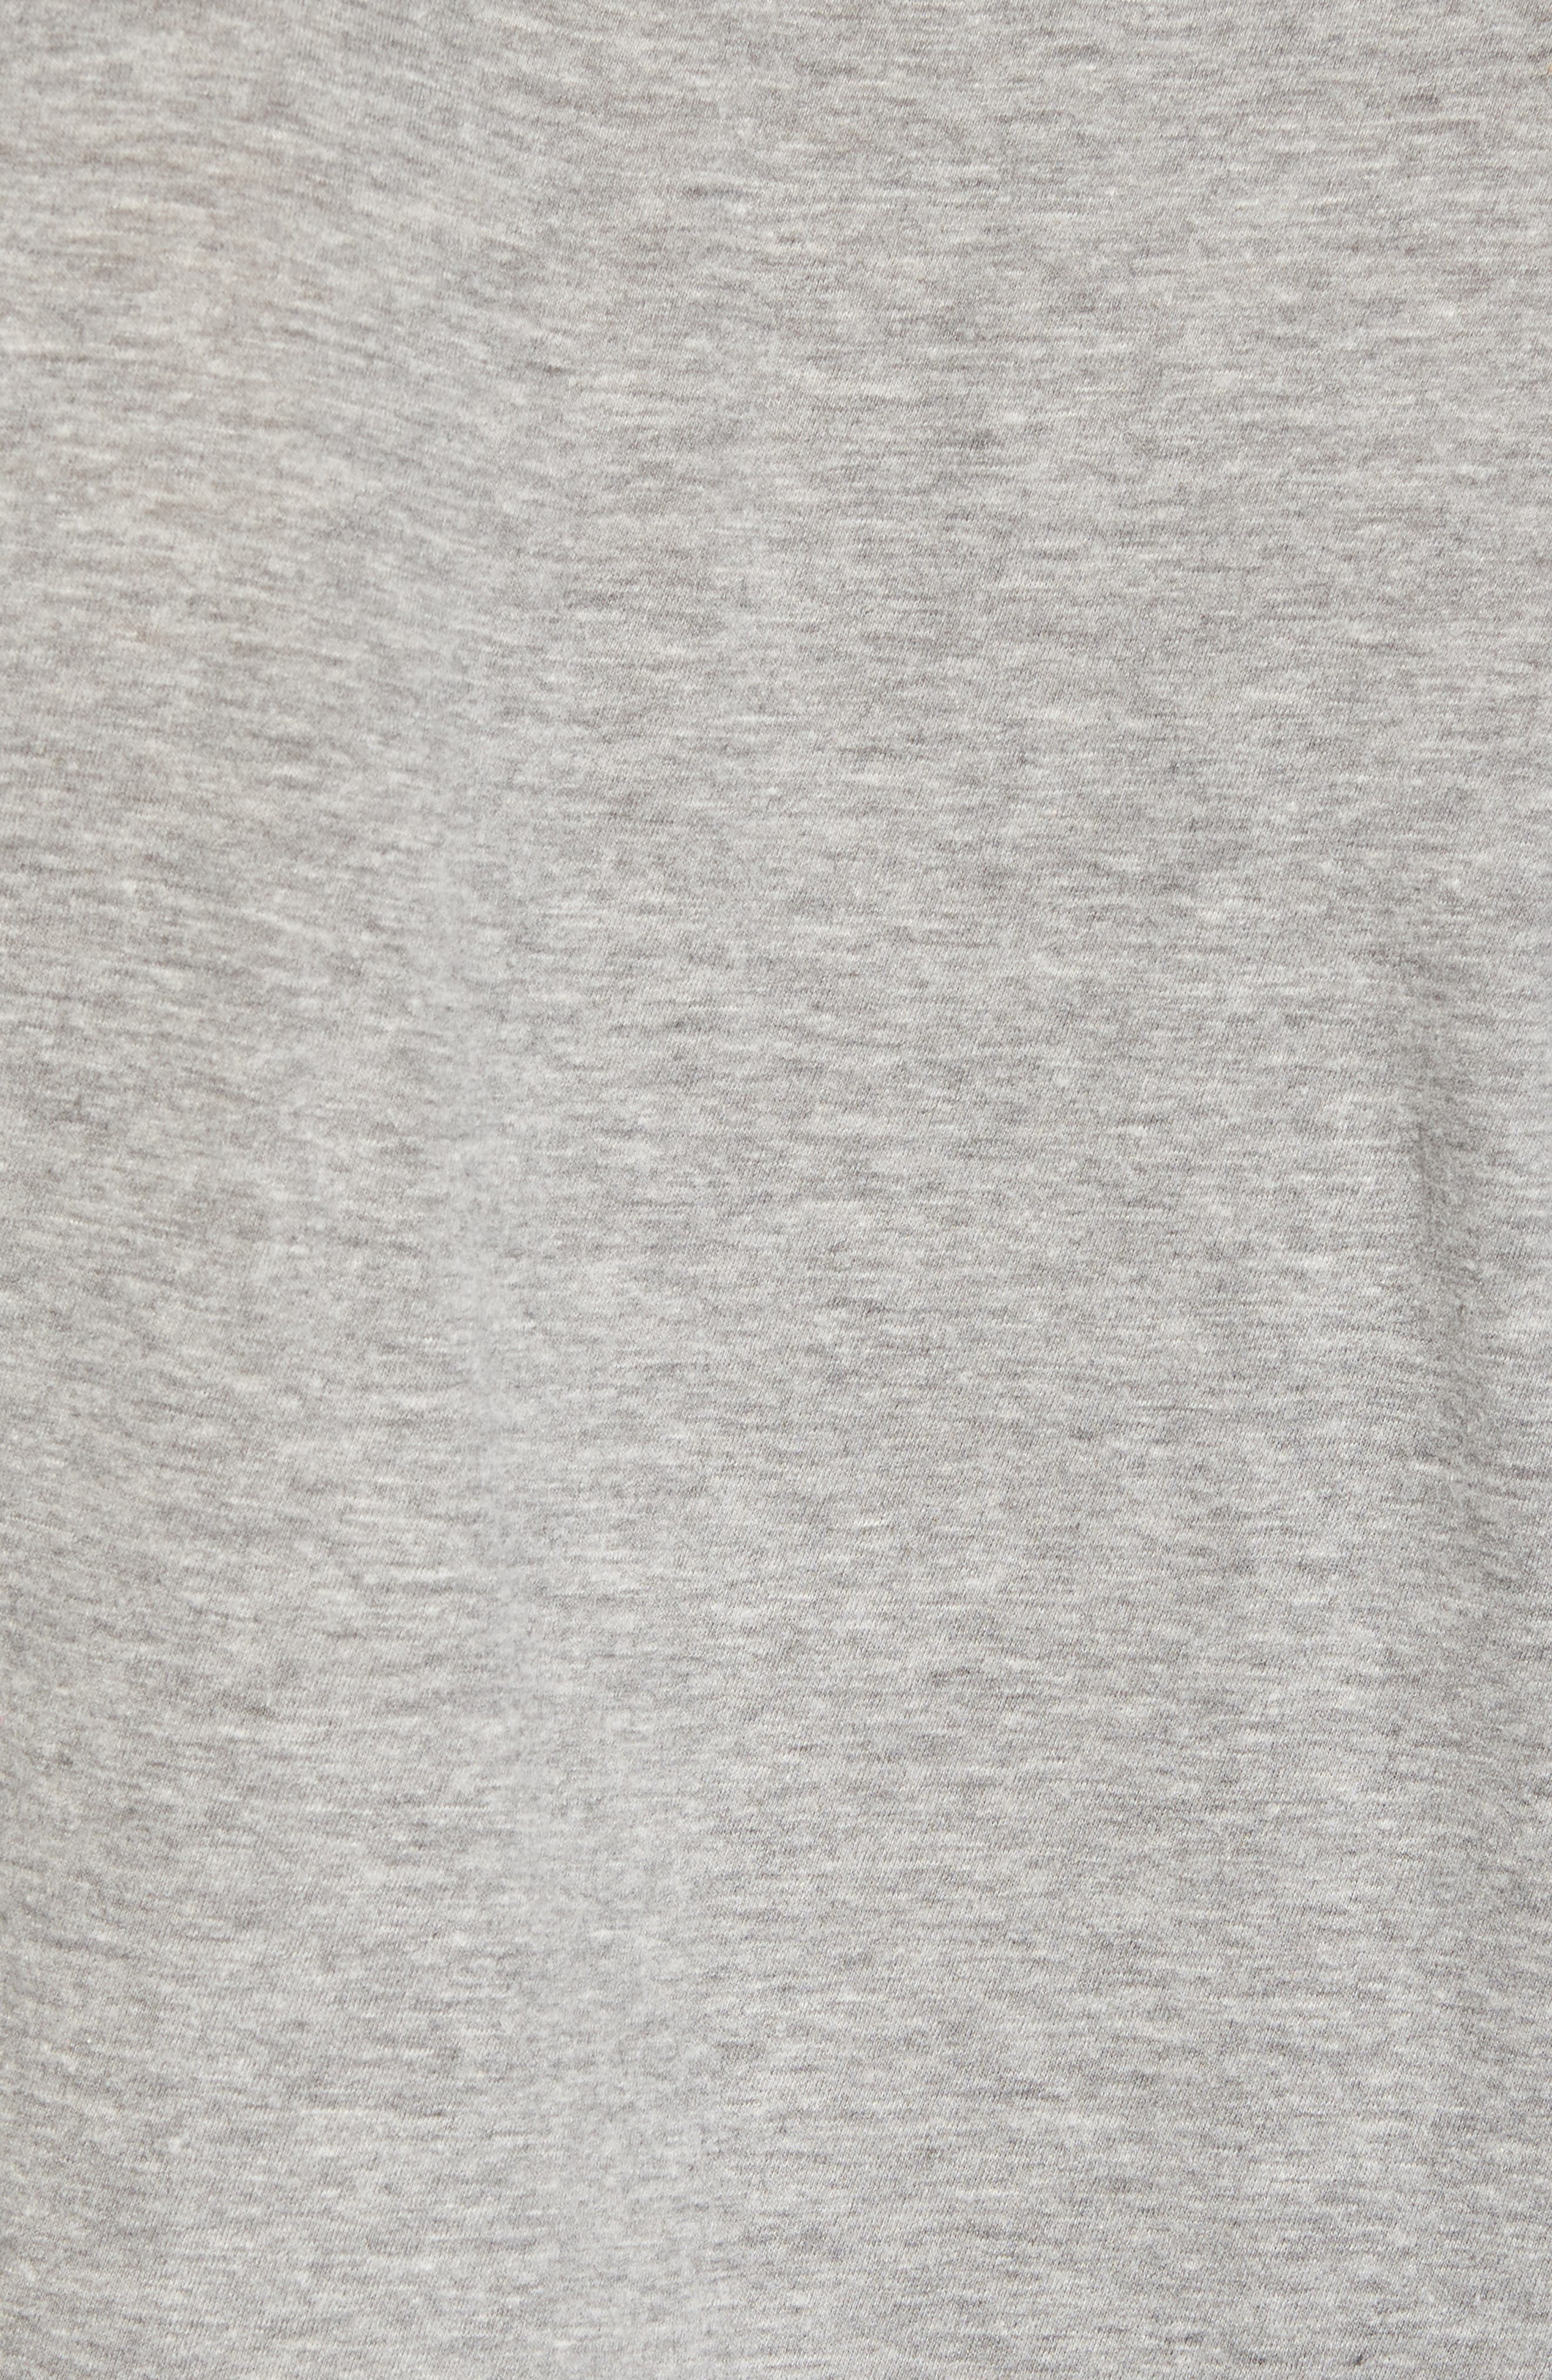 Portage Pittsburgh Penguins Ringer T-Shirt,                             Alternate thumbnail 5, color,